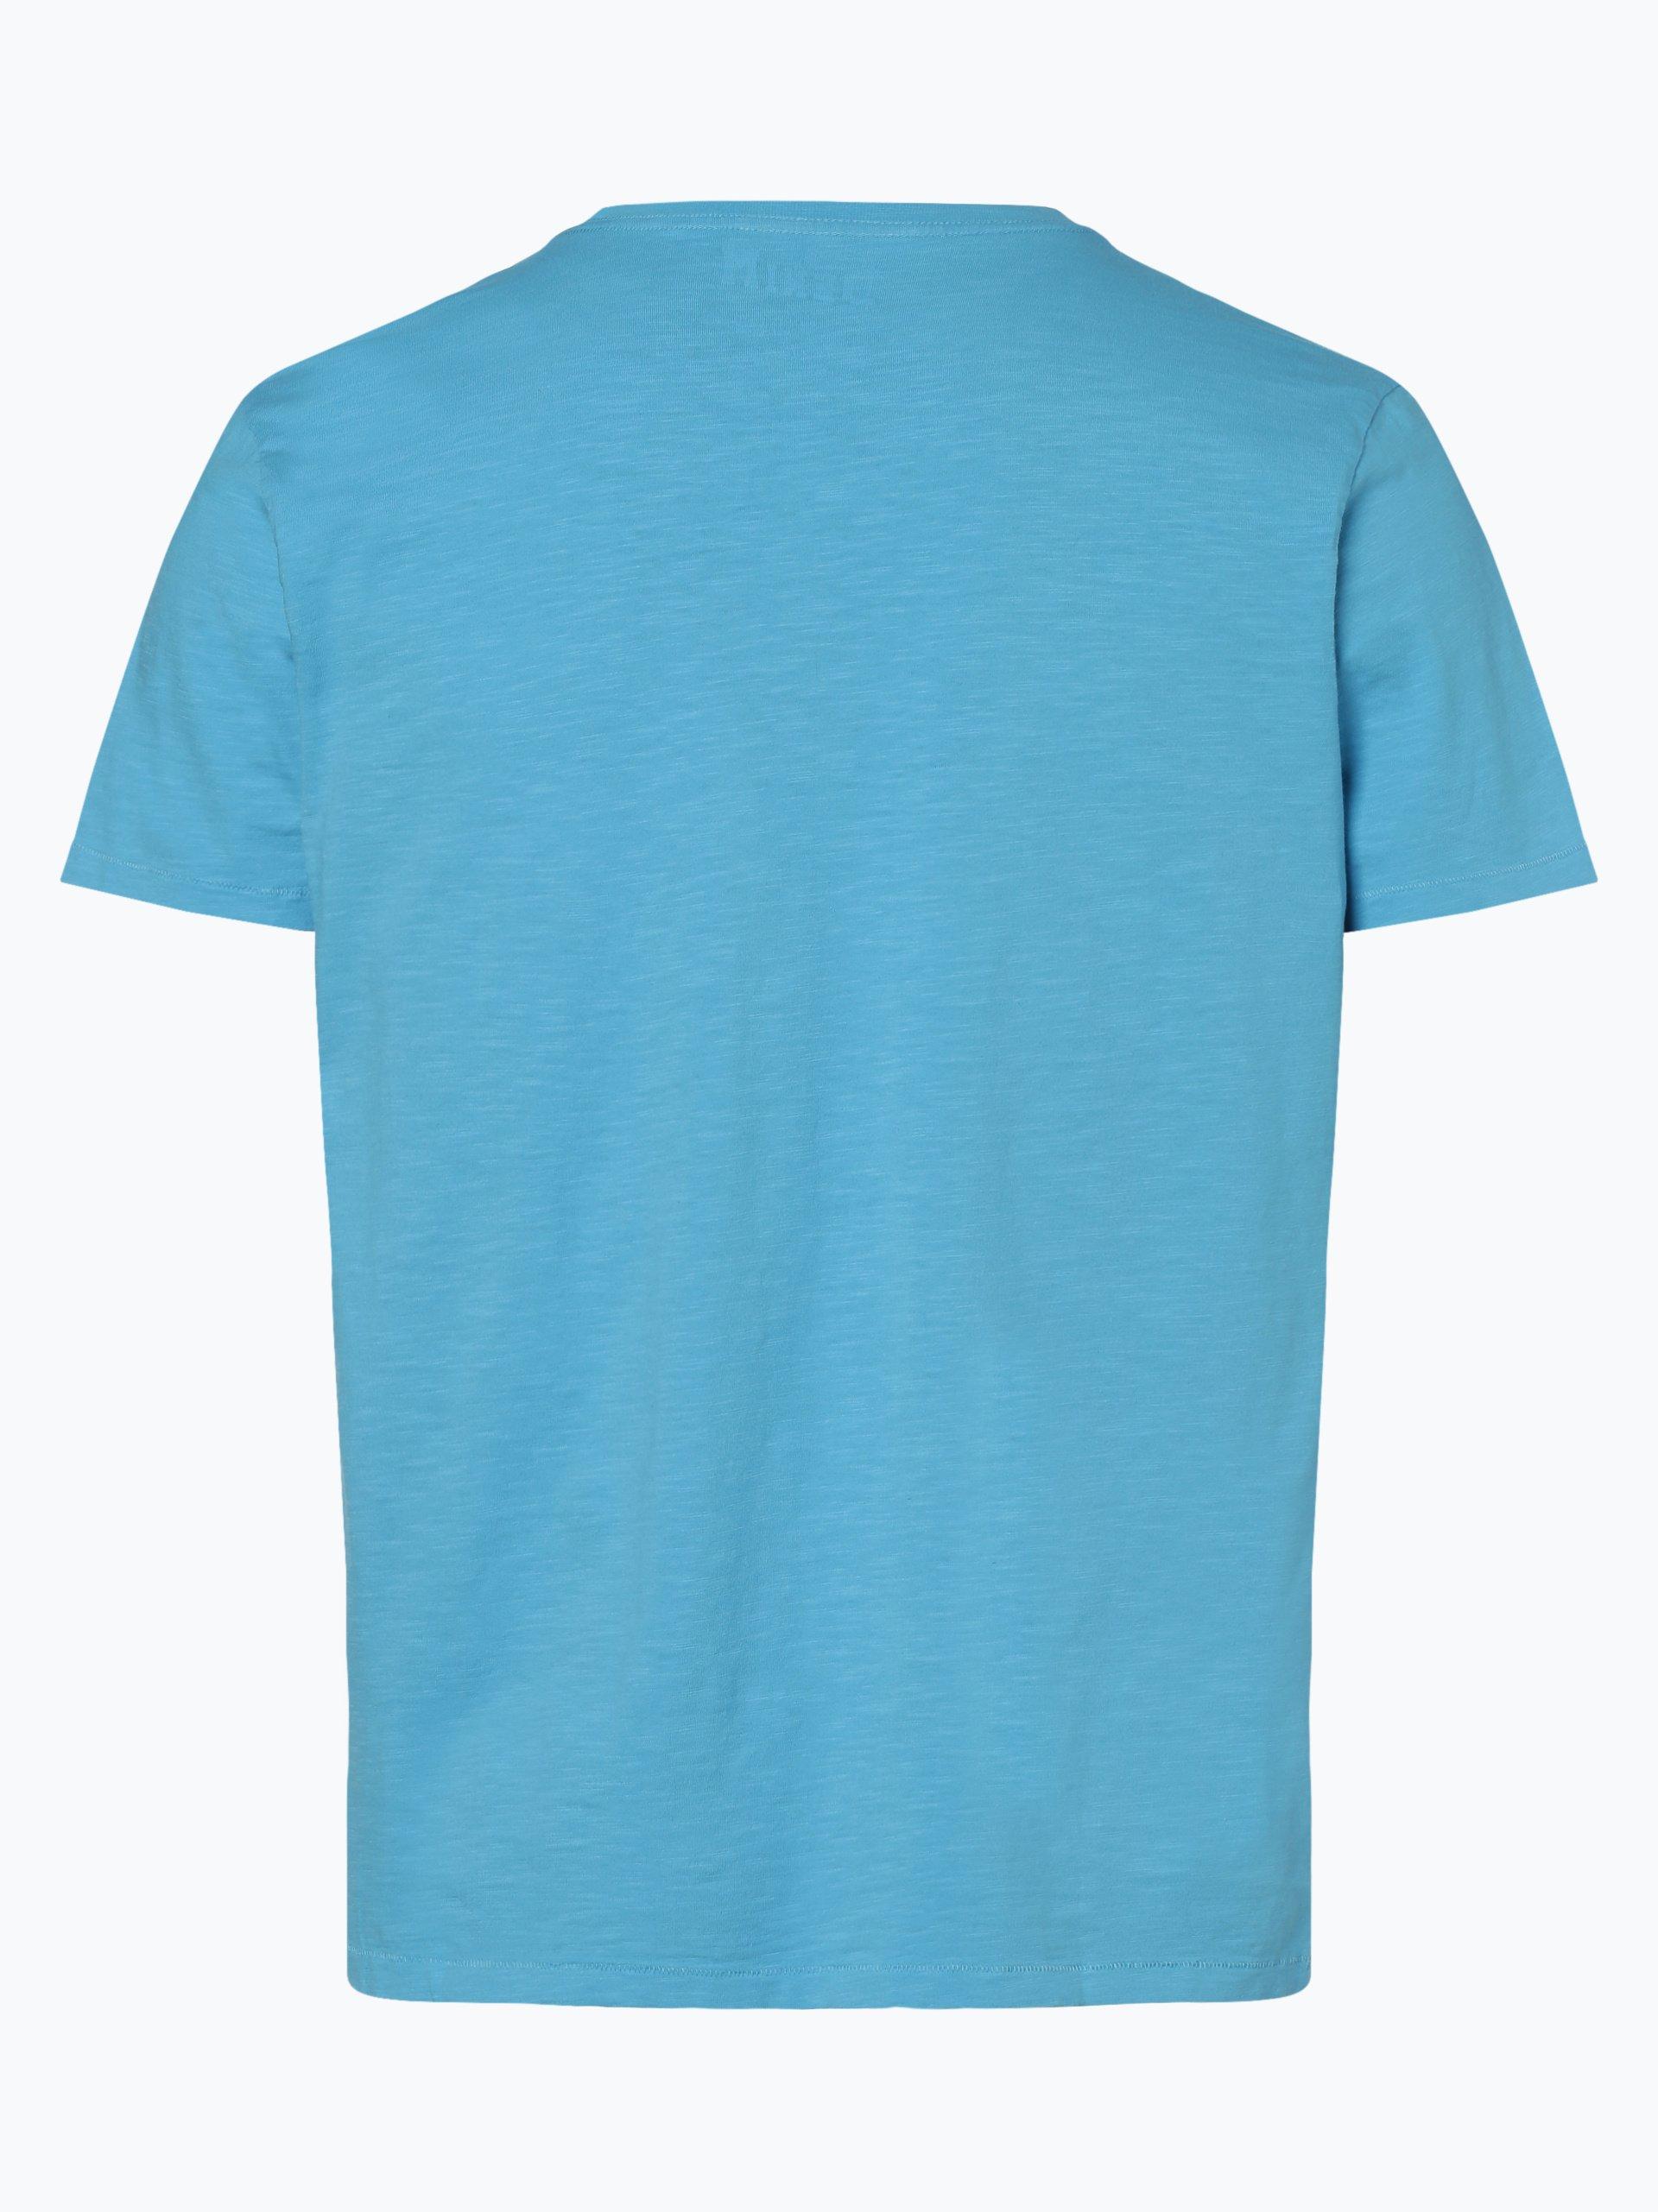 DENIM by Nils Sundström T-shirt męski